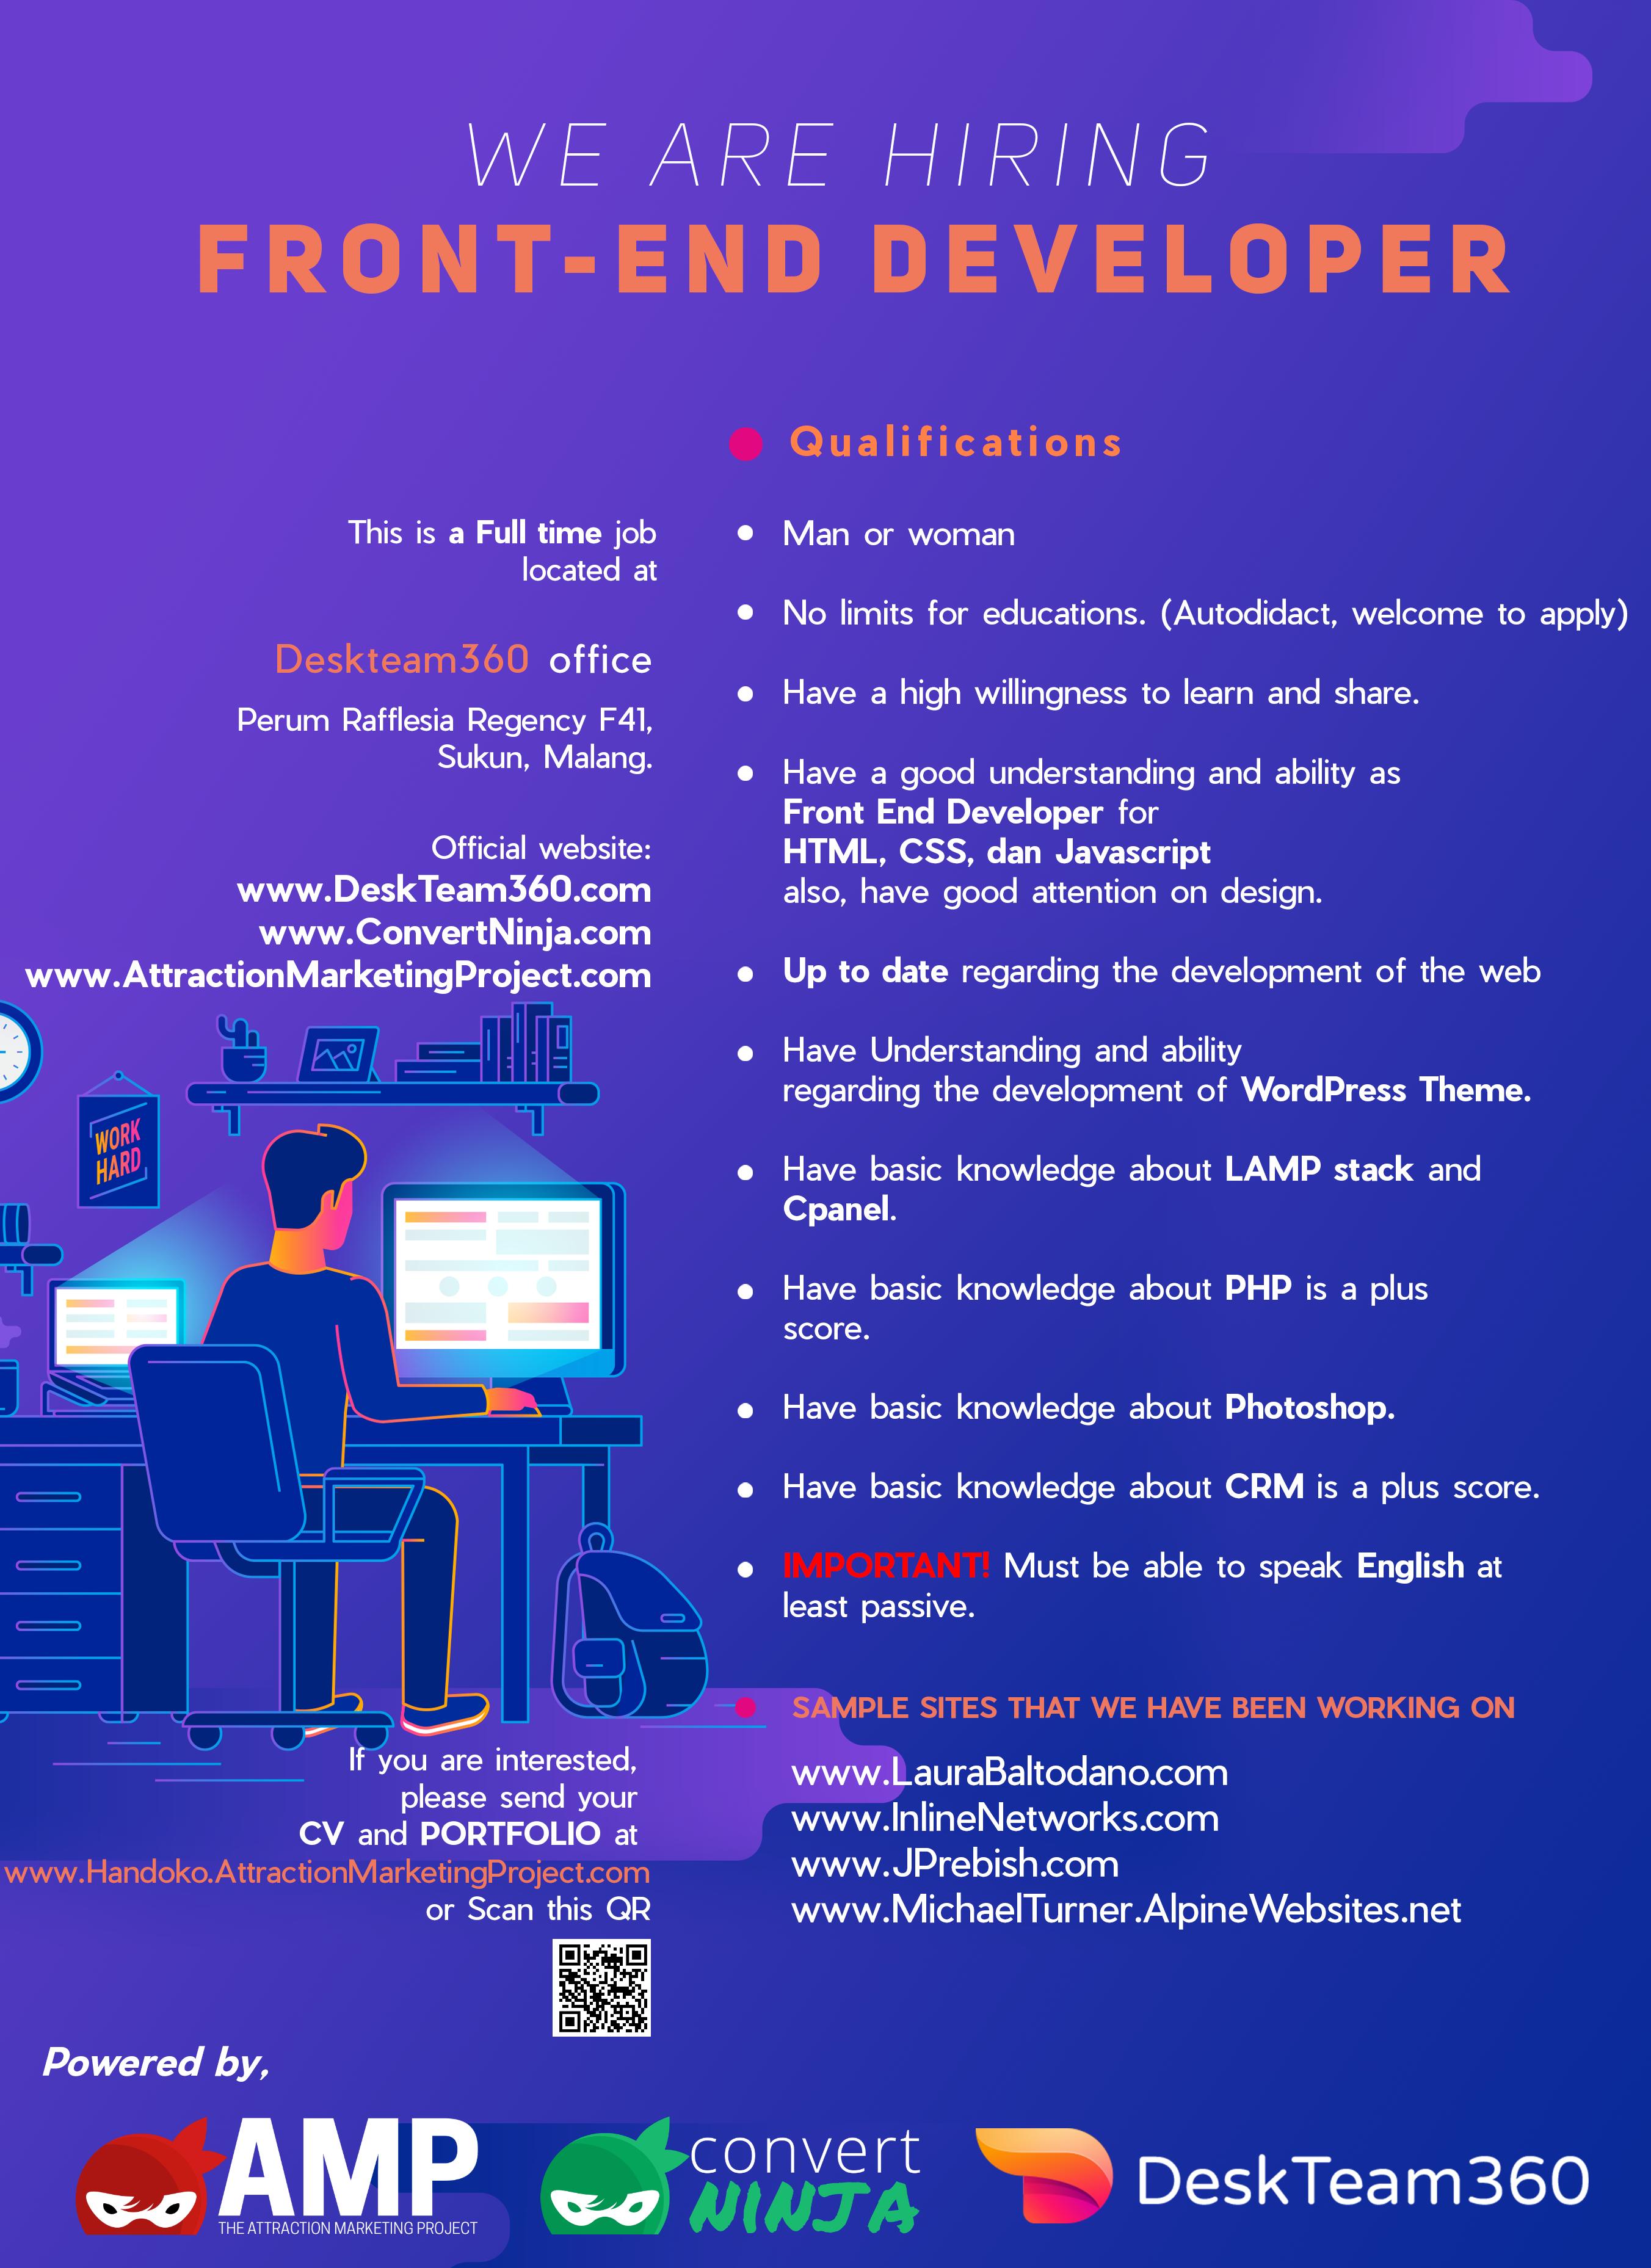 share-gaji-n-bahasa-program-kalian-khusus-programmer